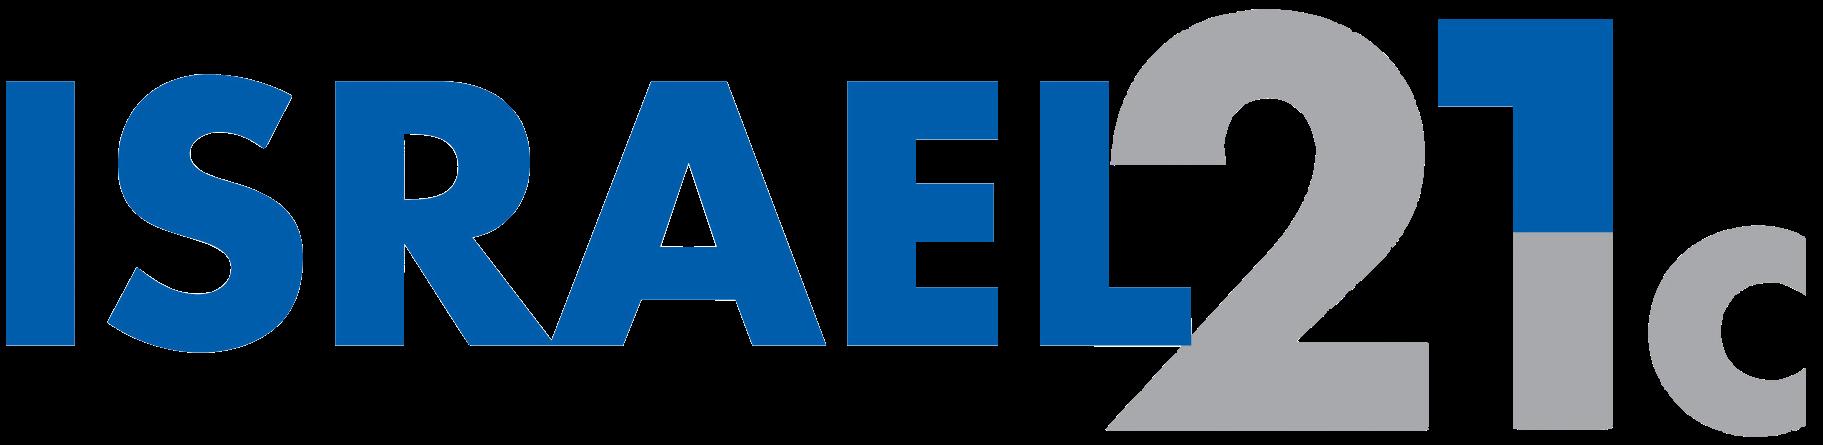 Israel21c Logo.png